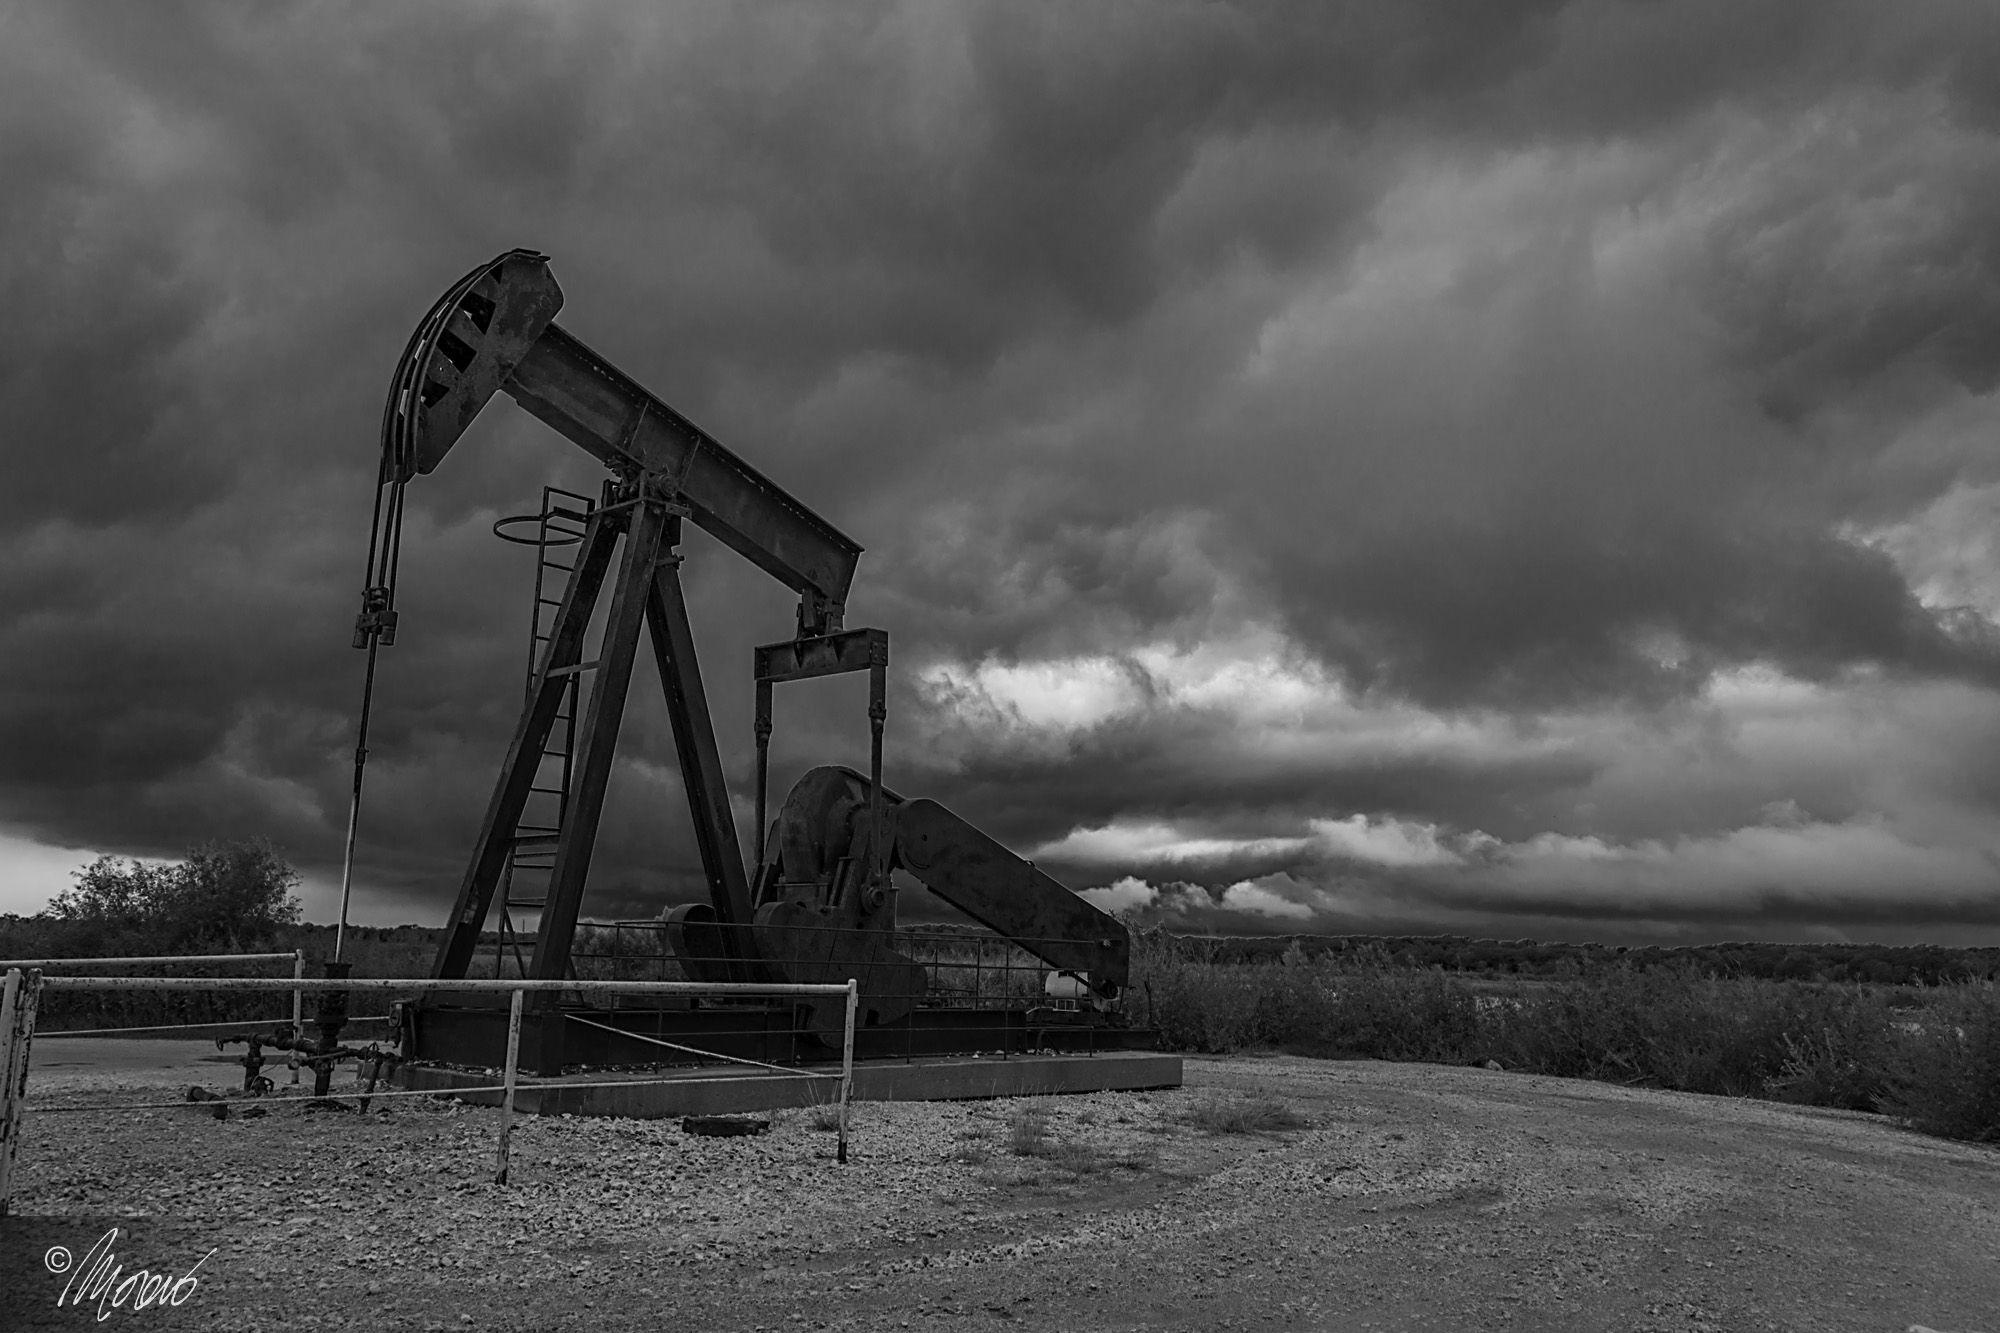 Hagerman National Wildlife Refuge, Oil Derrick, Texas